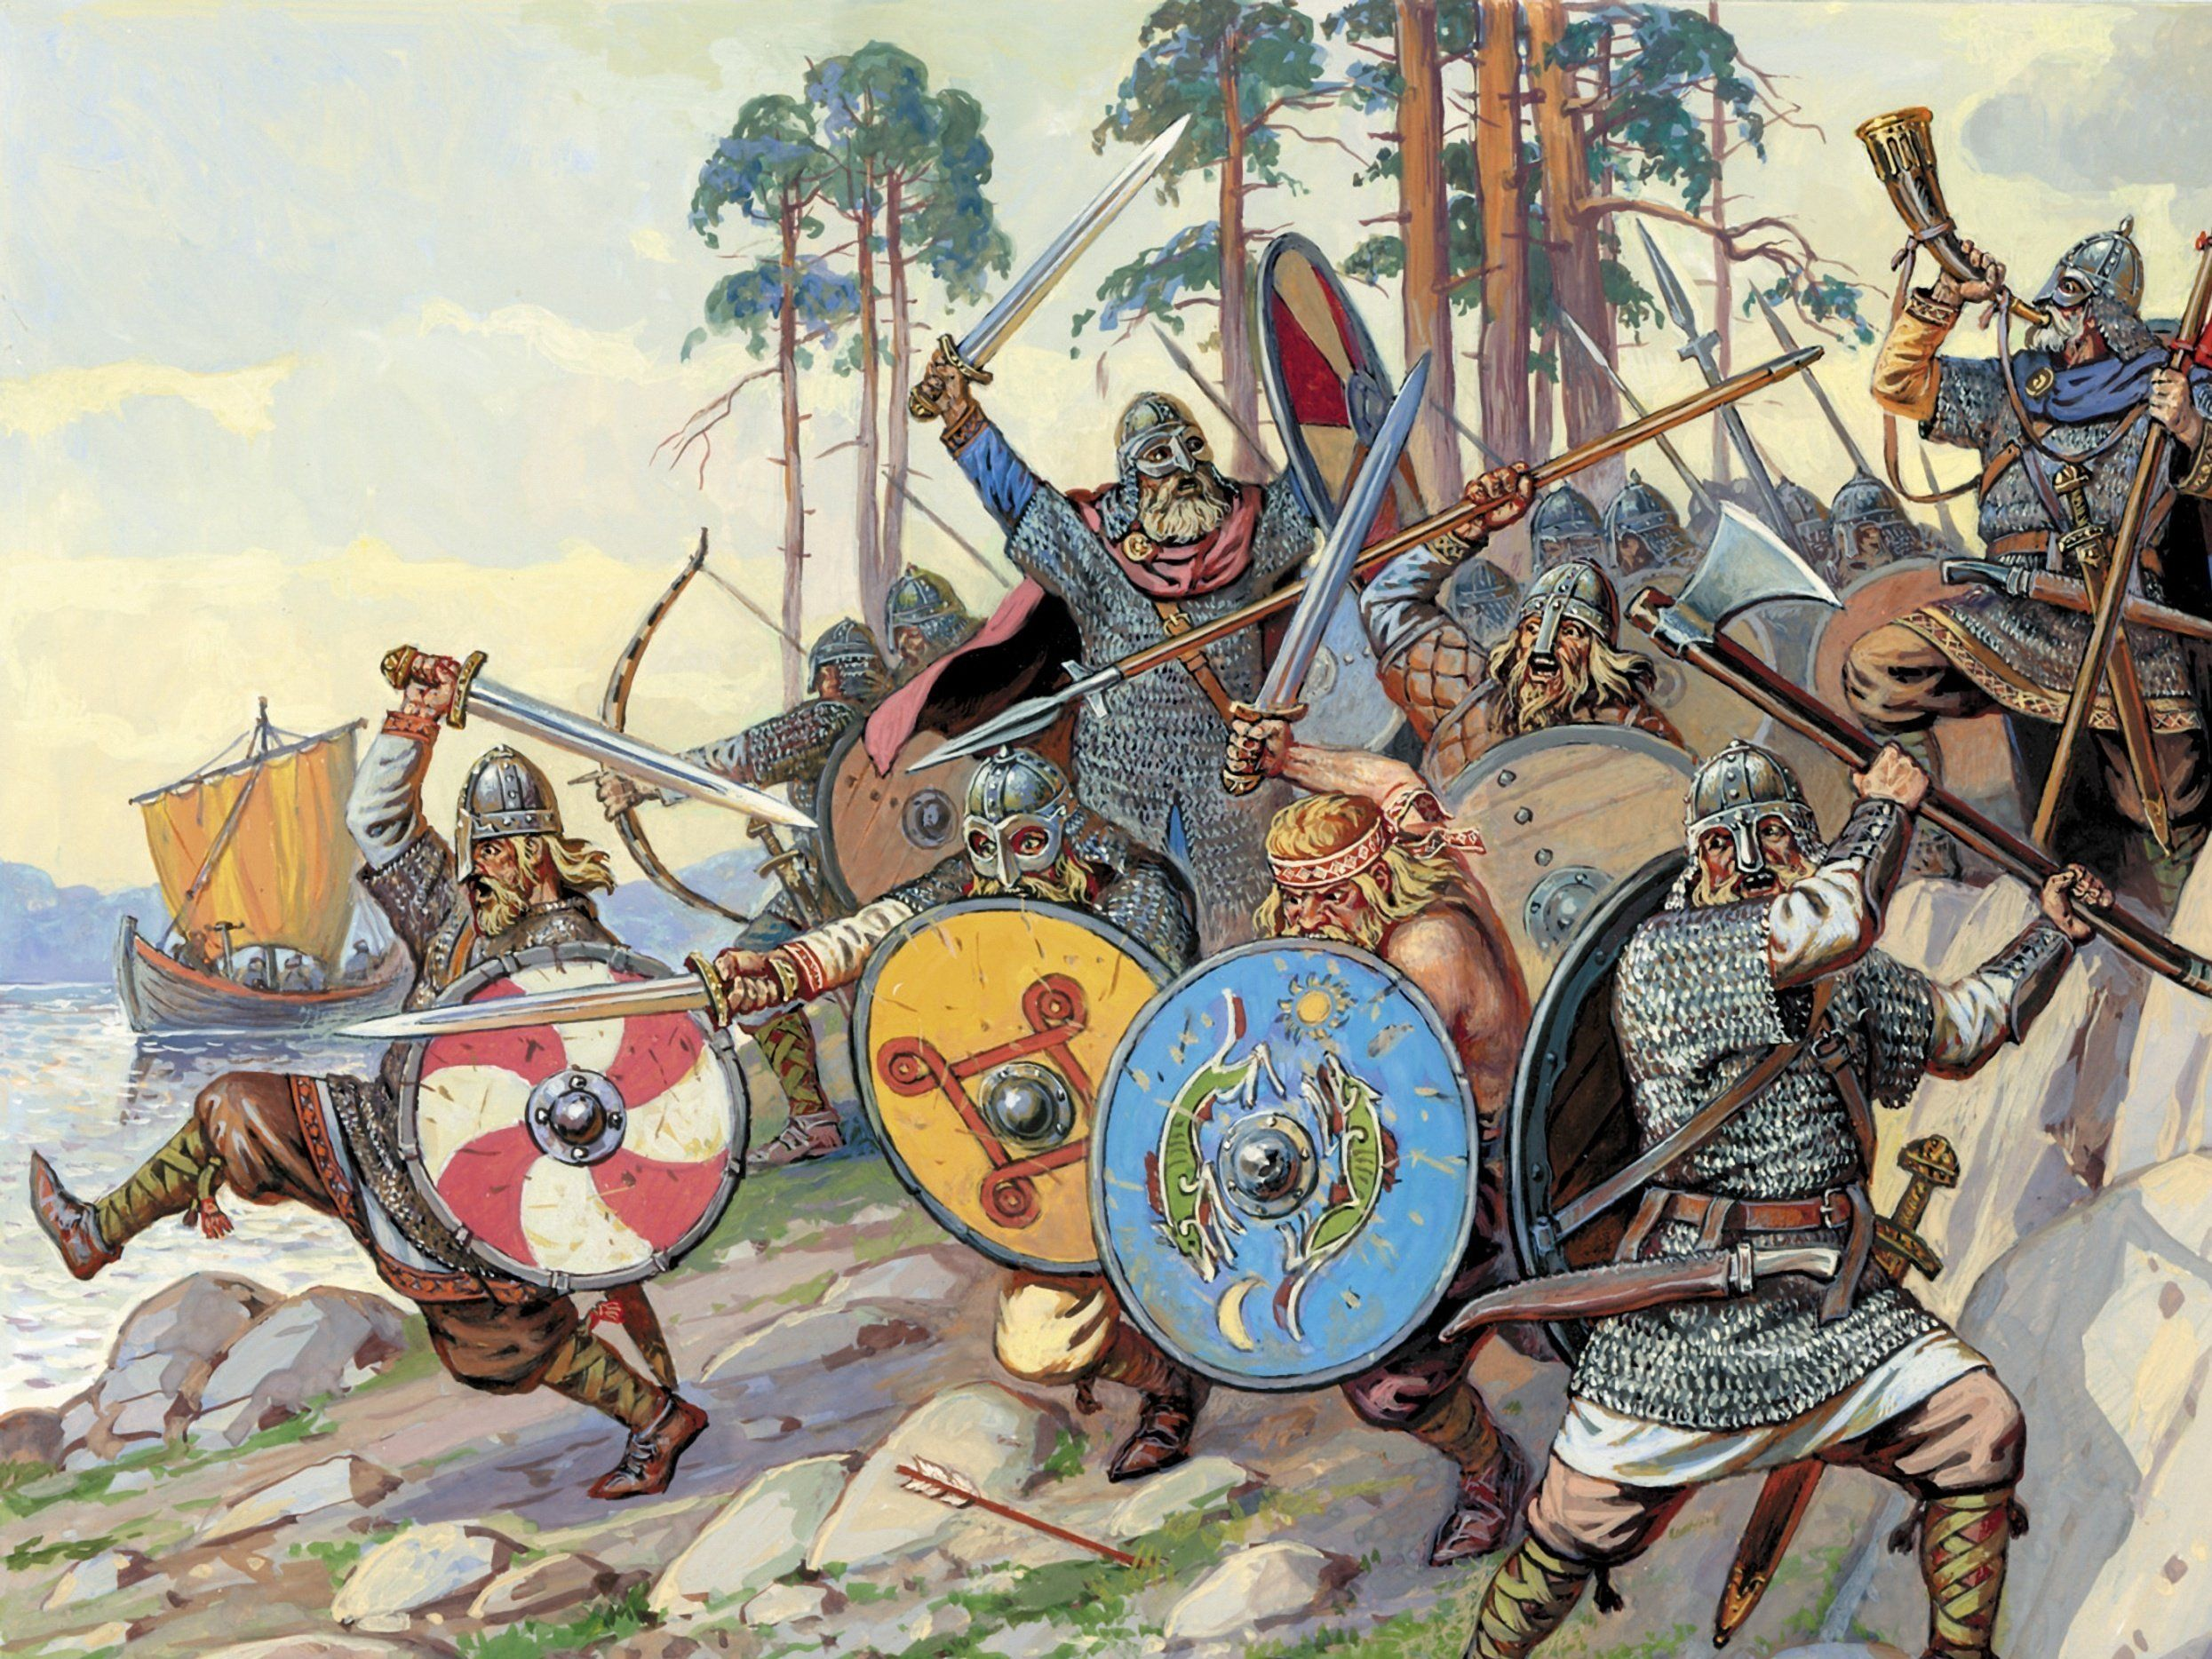 History Of Art Meno Istorija History Of Art Art History Europe Art World Art Vikings Art History Viking Art